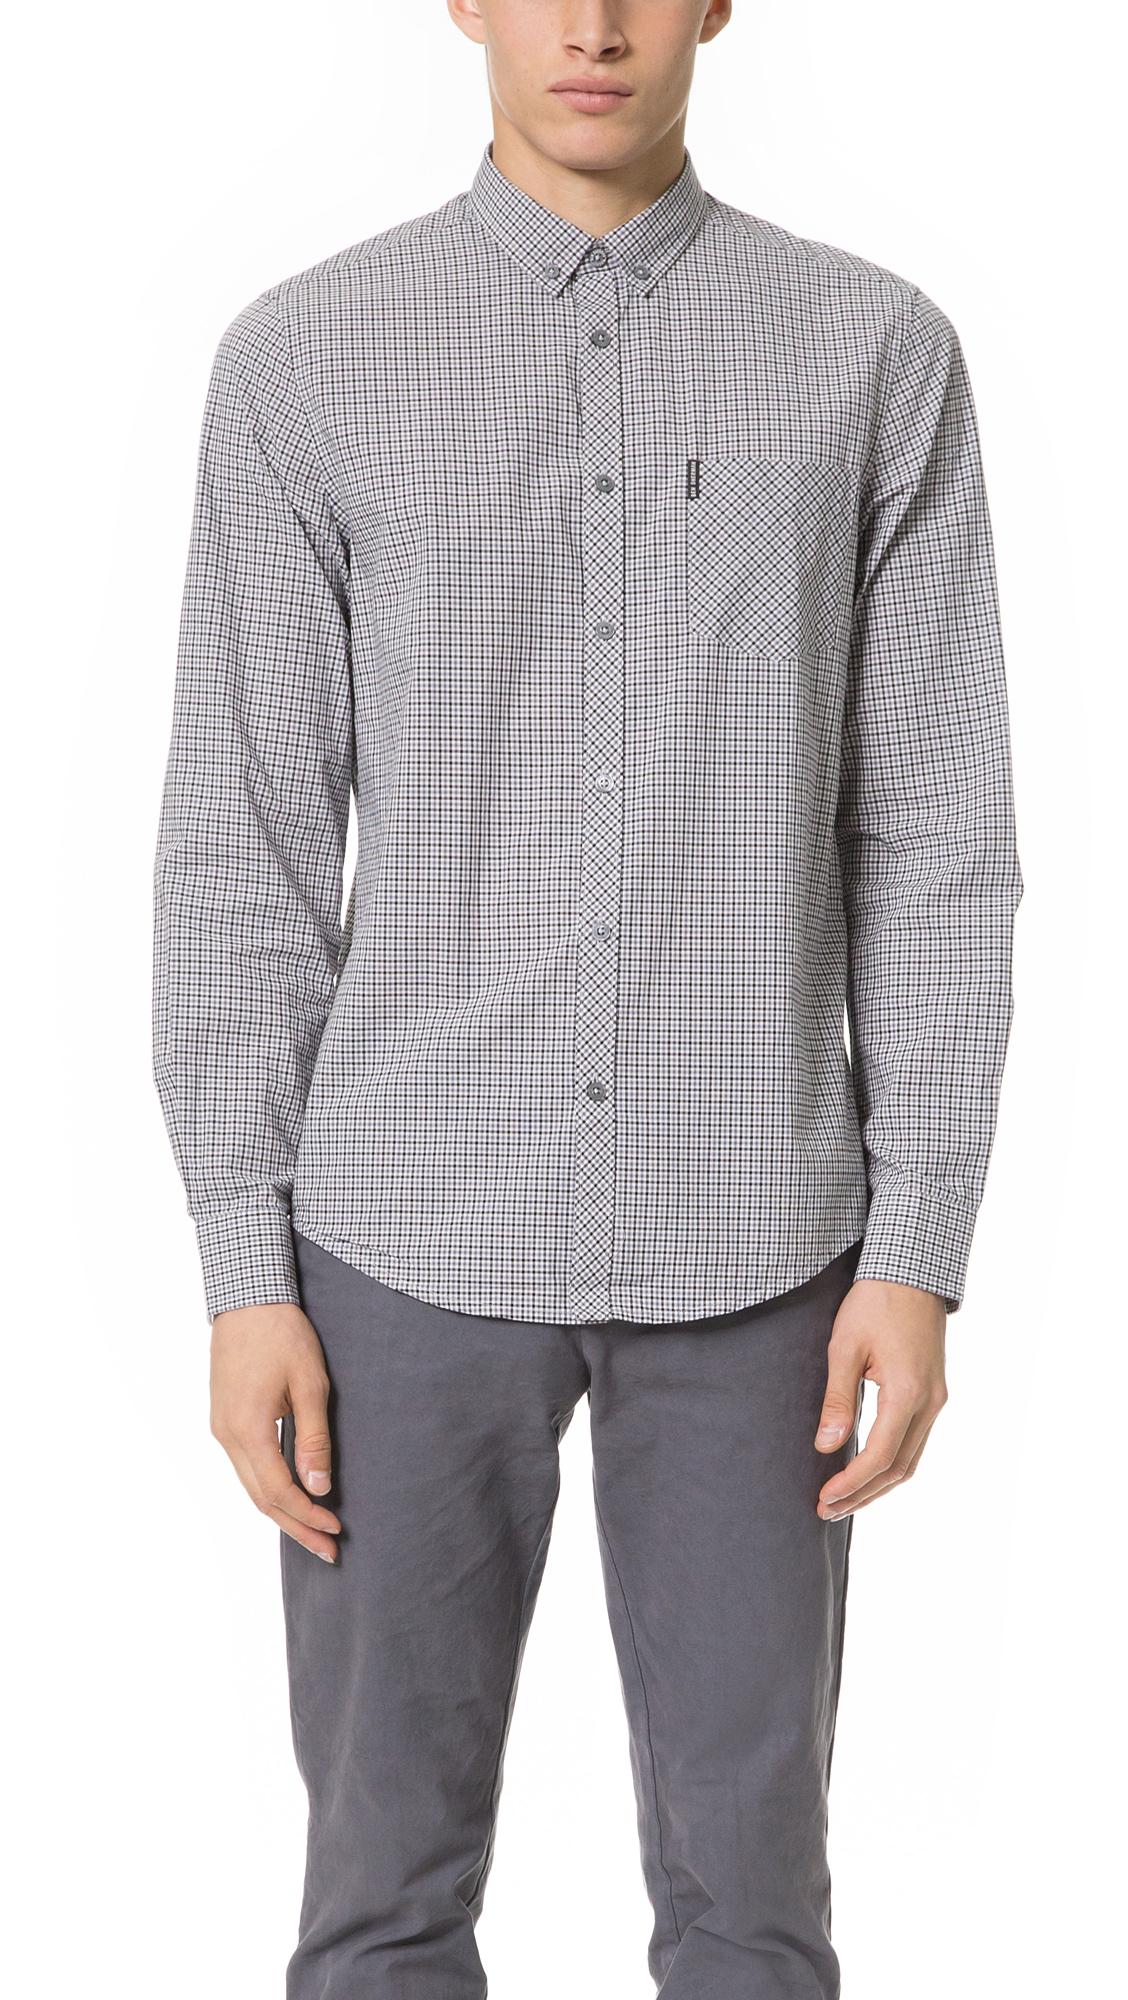 Lyst Ben Sherman Plaid Shirt In Gray For Men